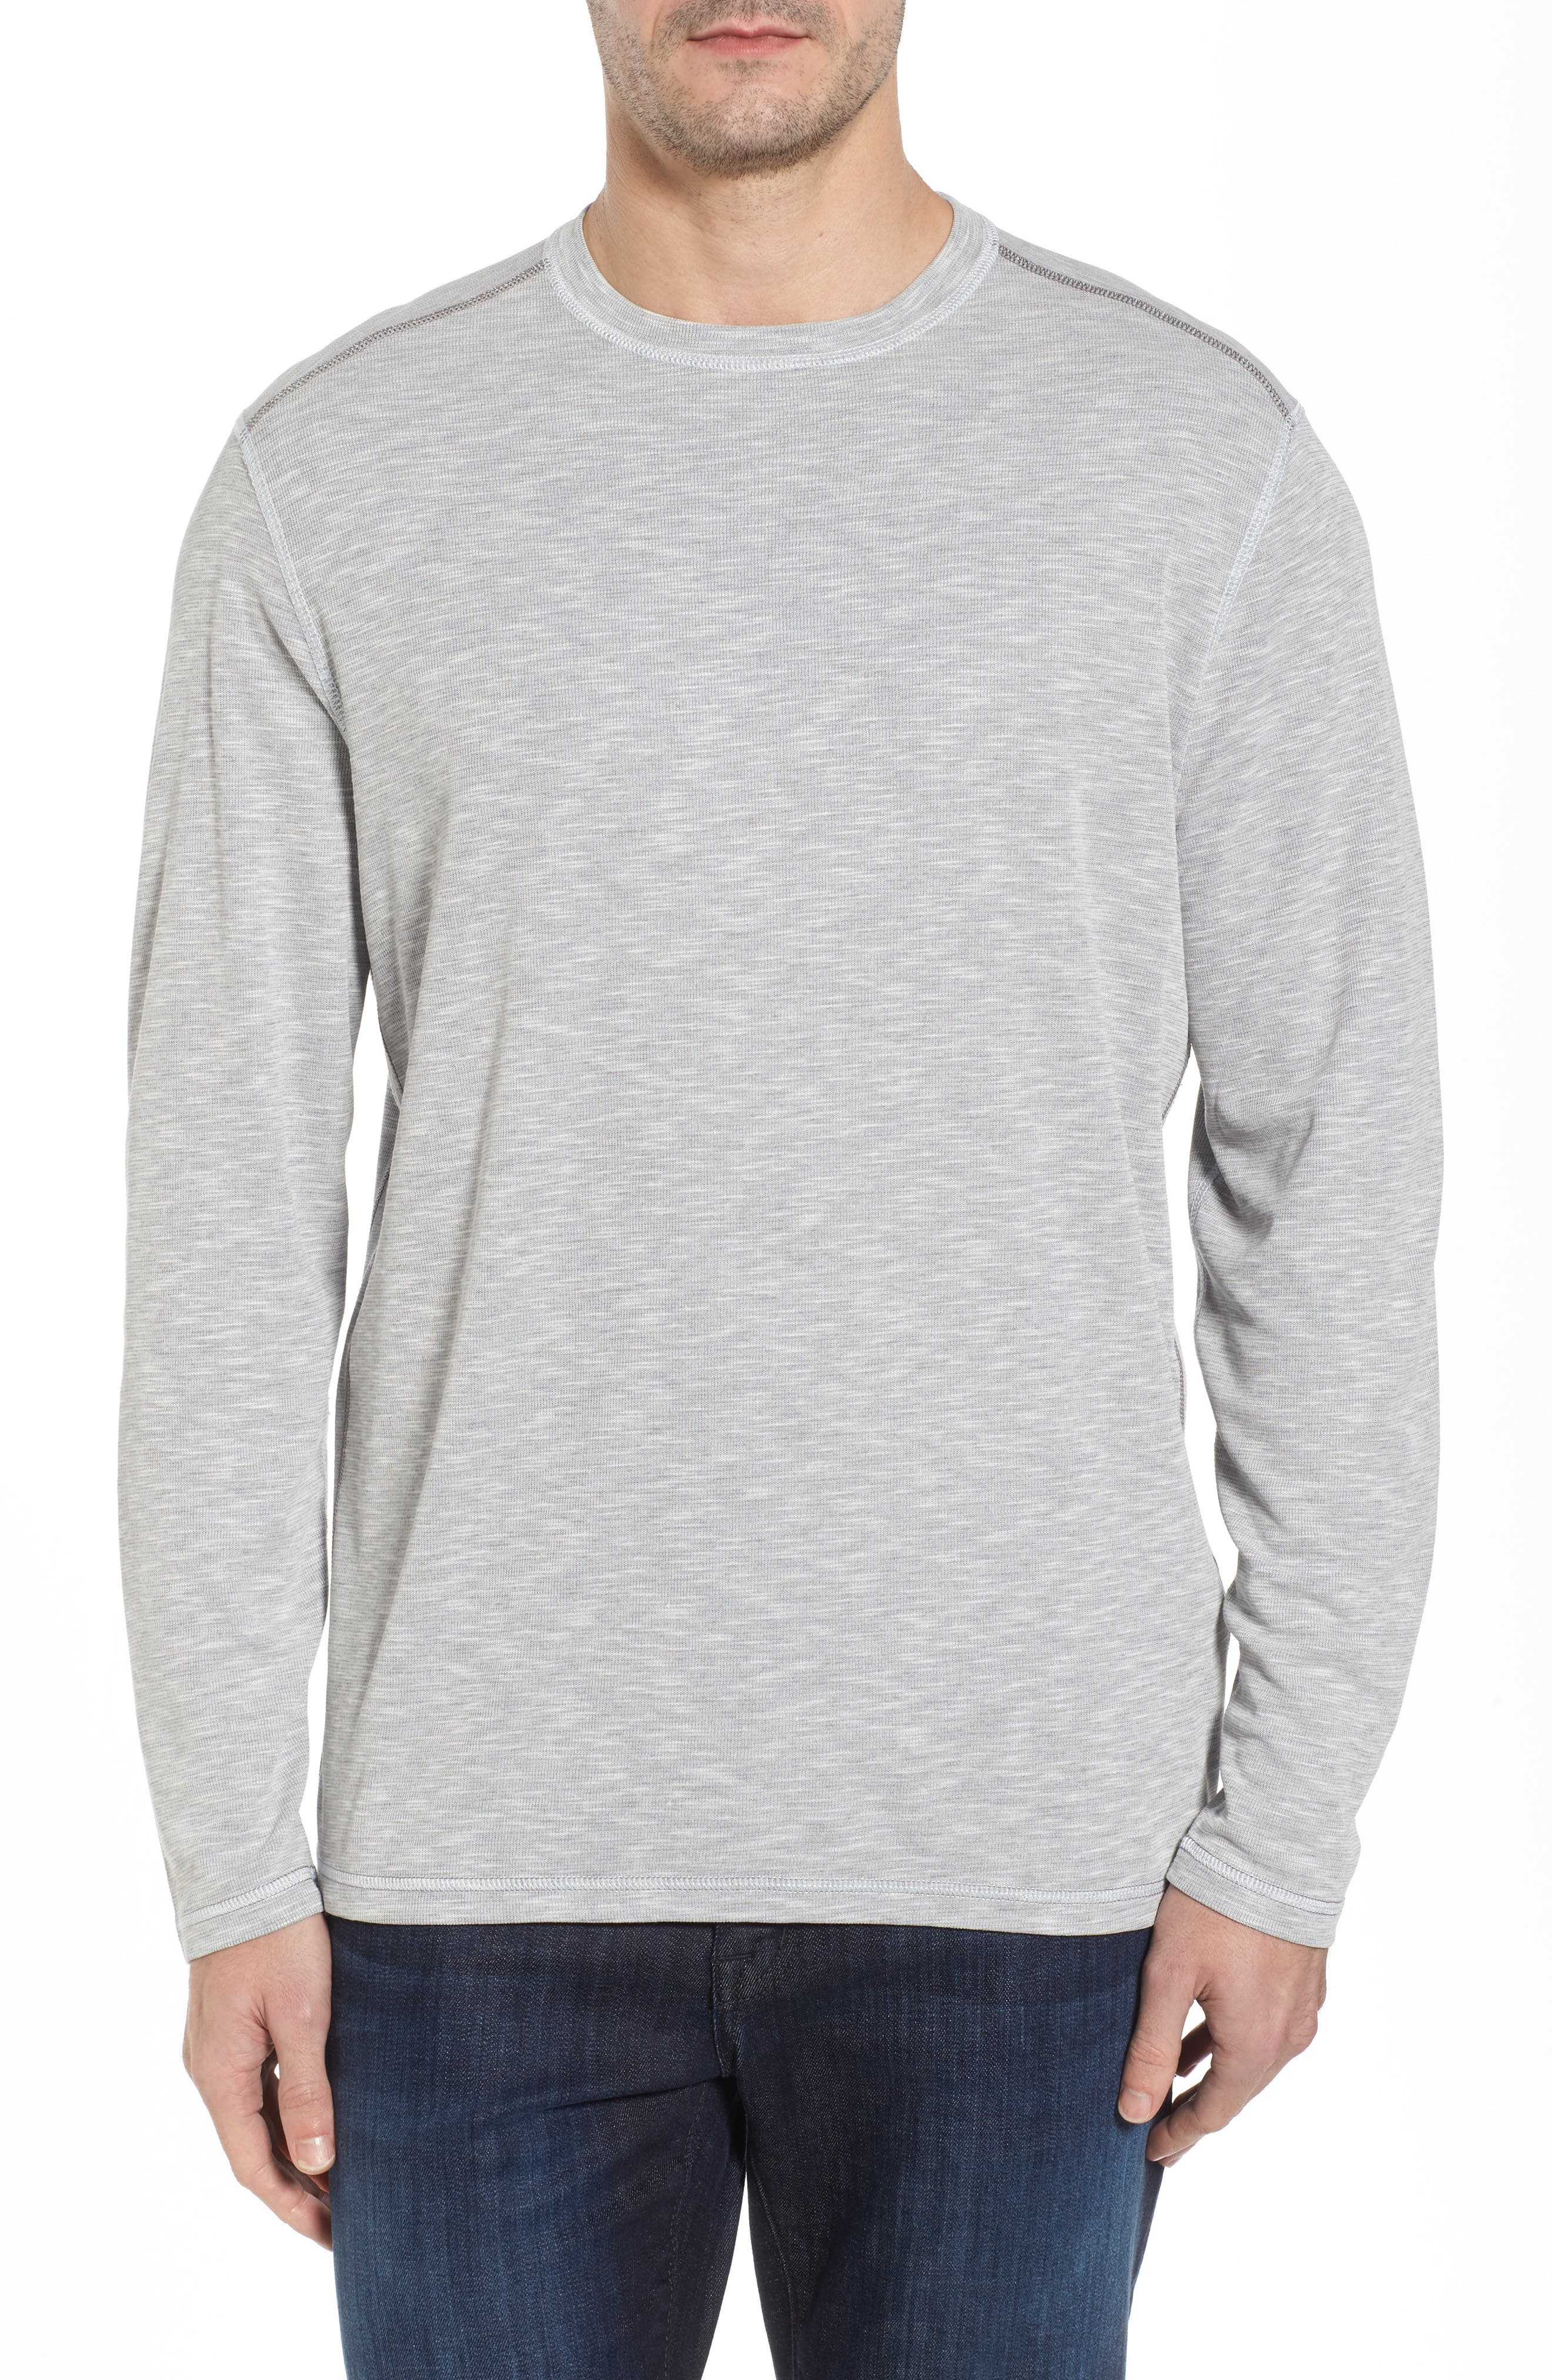 Main Image - Tommy Bahama Flip Tide Long Sleeve T-Shirt